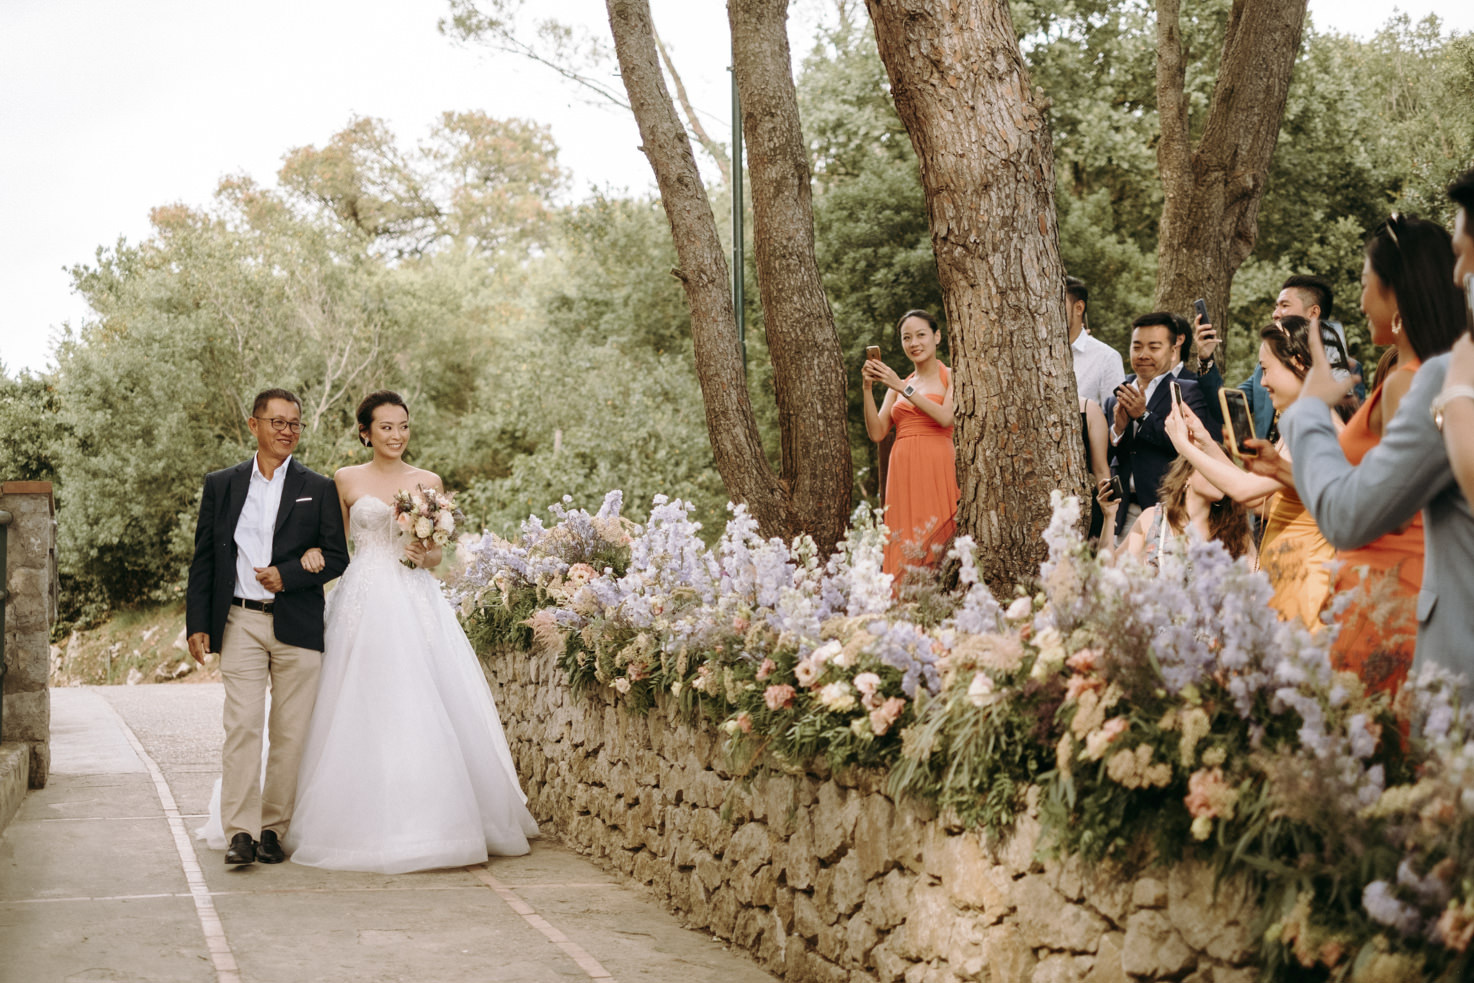 Arrival of the bride in Capri